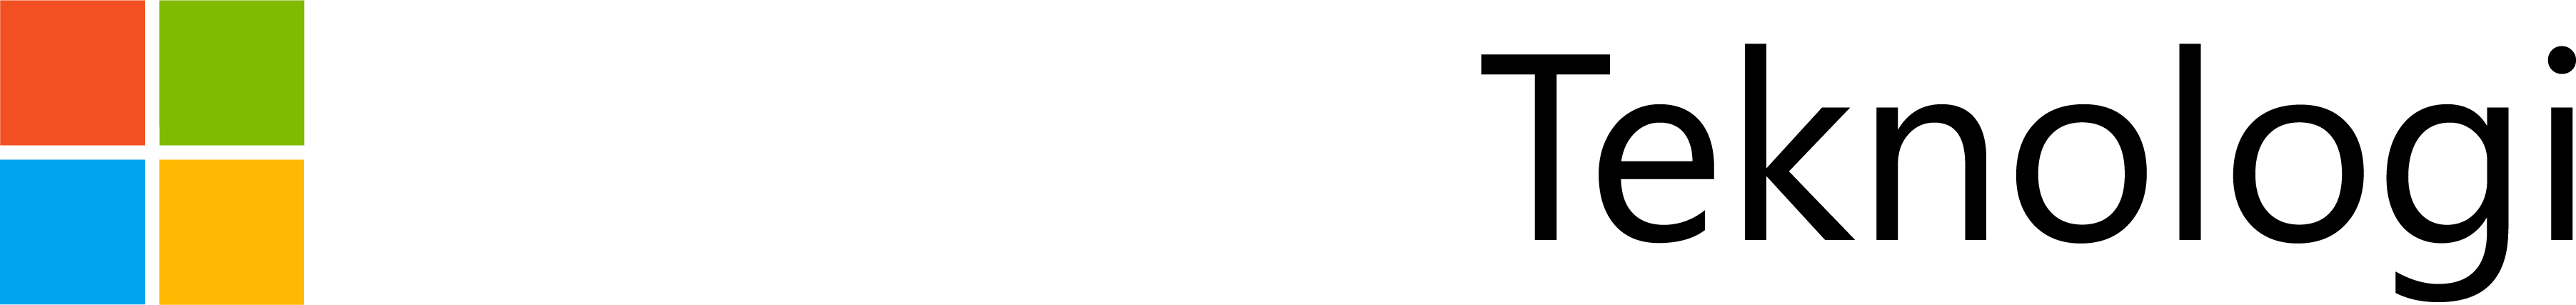 Microsoft Teknologi